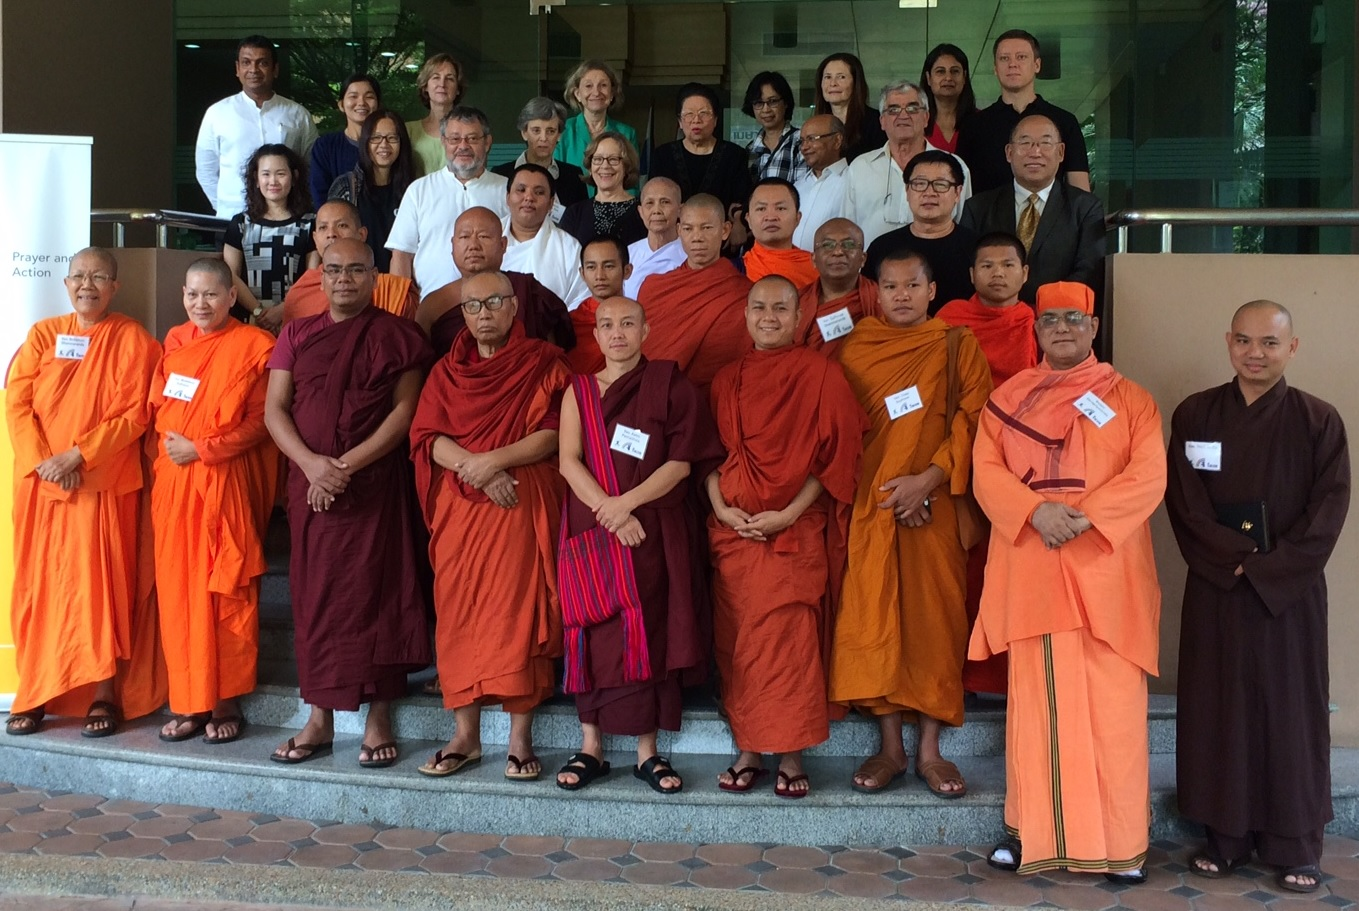 Los santos buddhist dating site